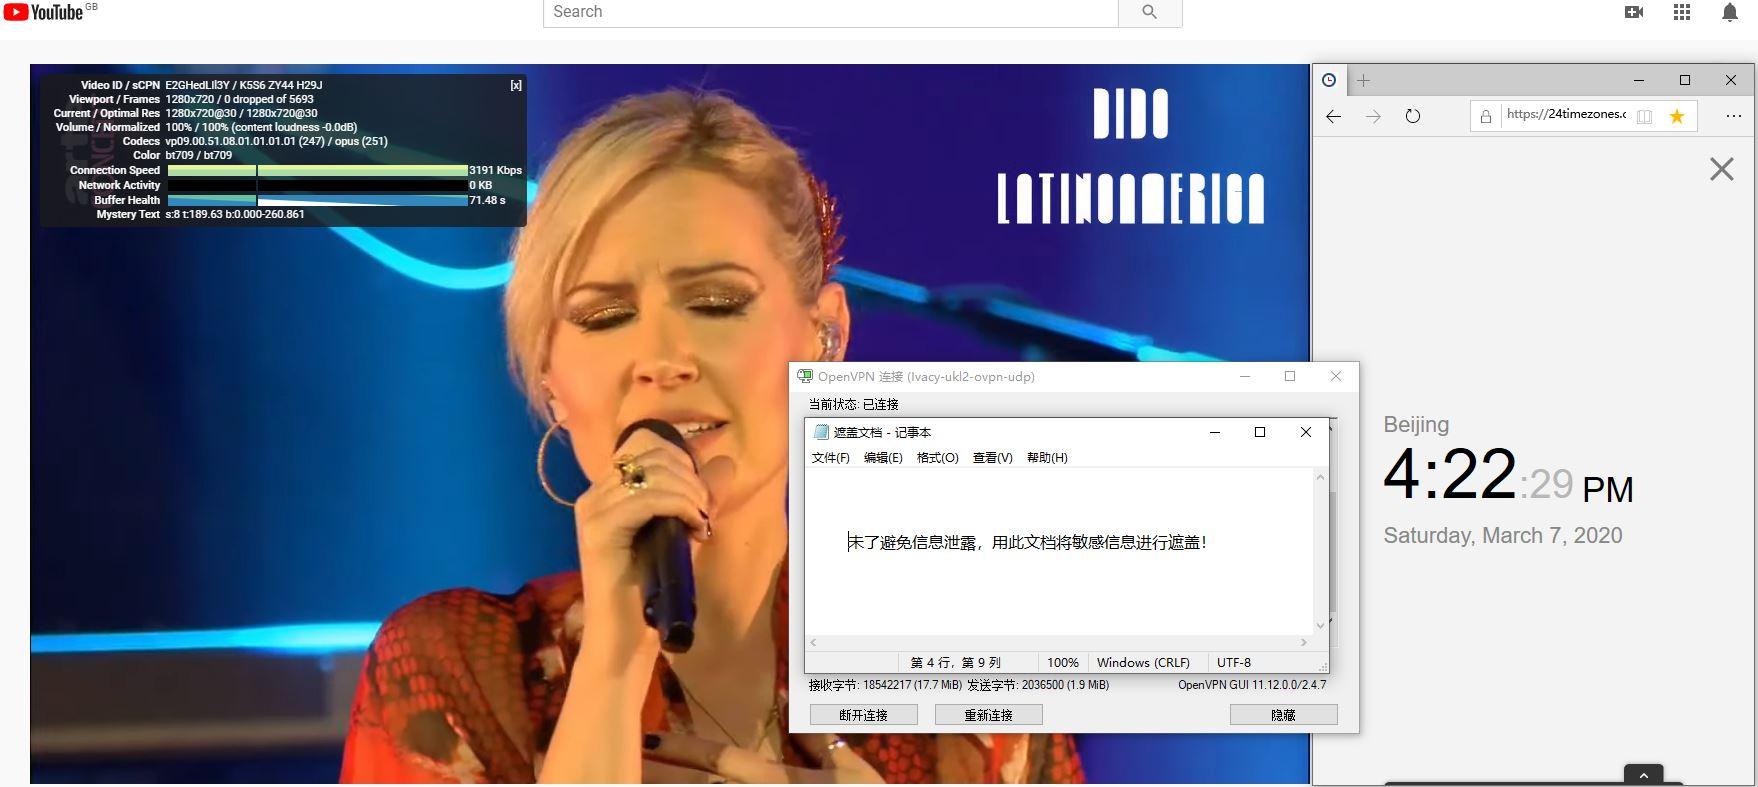 Windows10 IvacyVPN OpenVPN UKL2 中国VPN翻墙 科学上网 Youtube测速 - 20200307